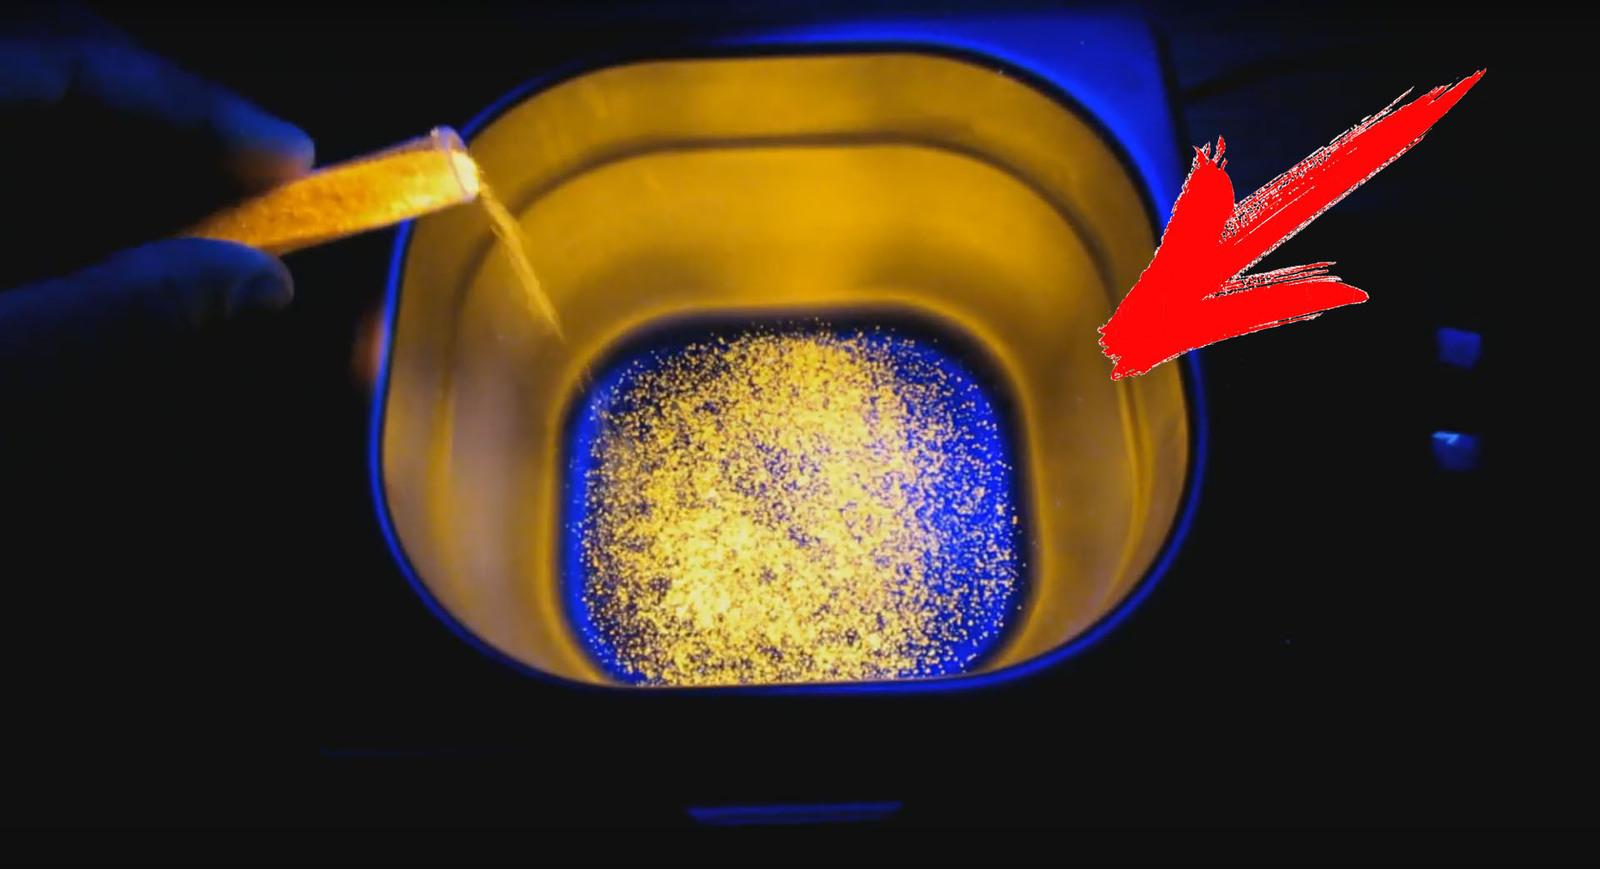 Как устроена ультразвуковая ванна